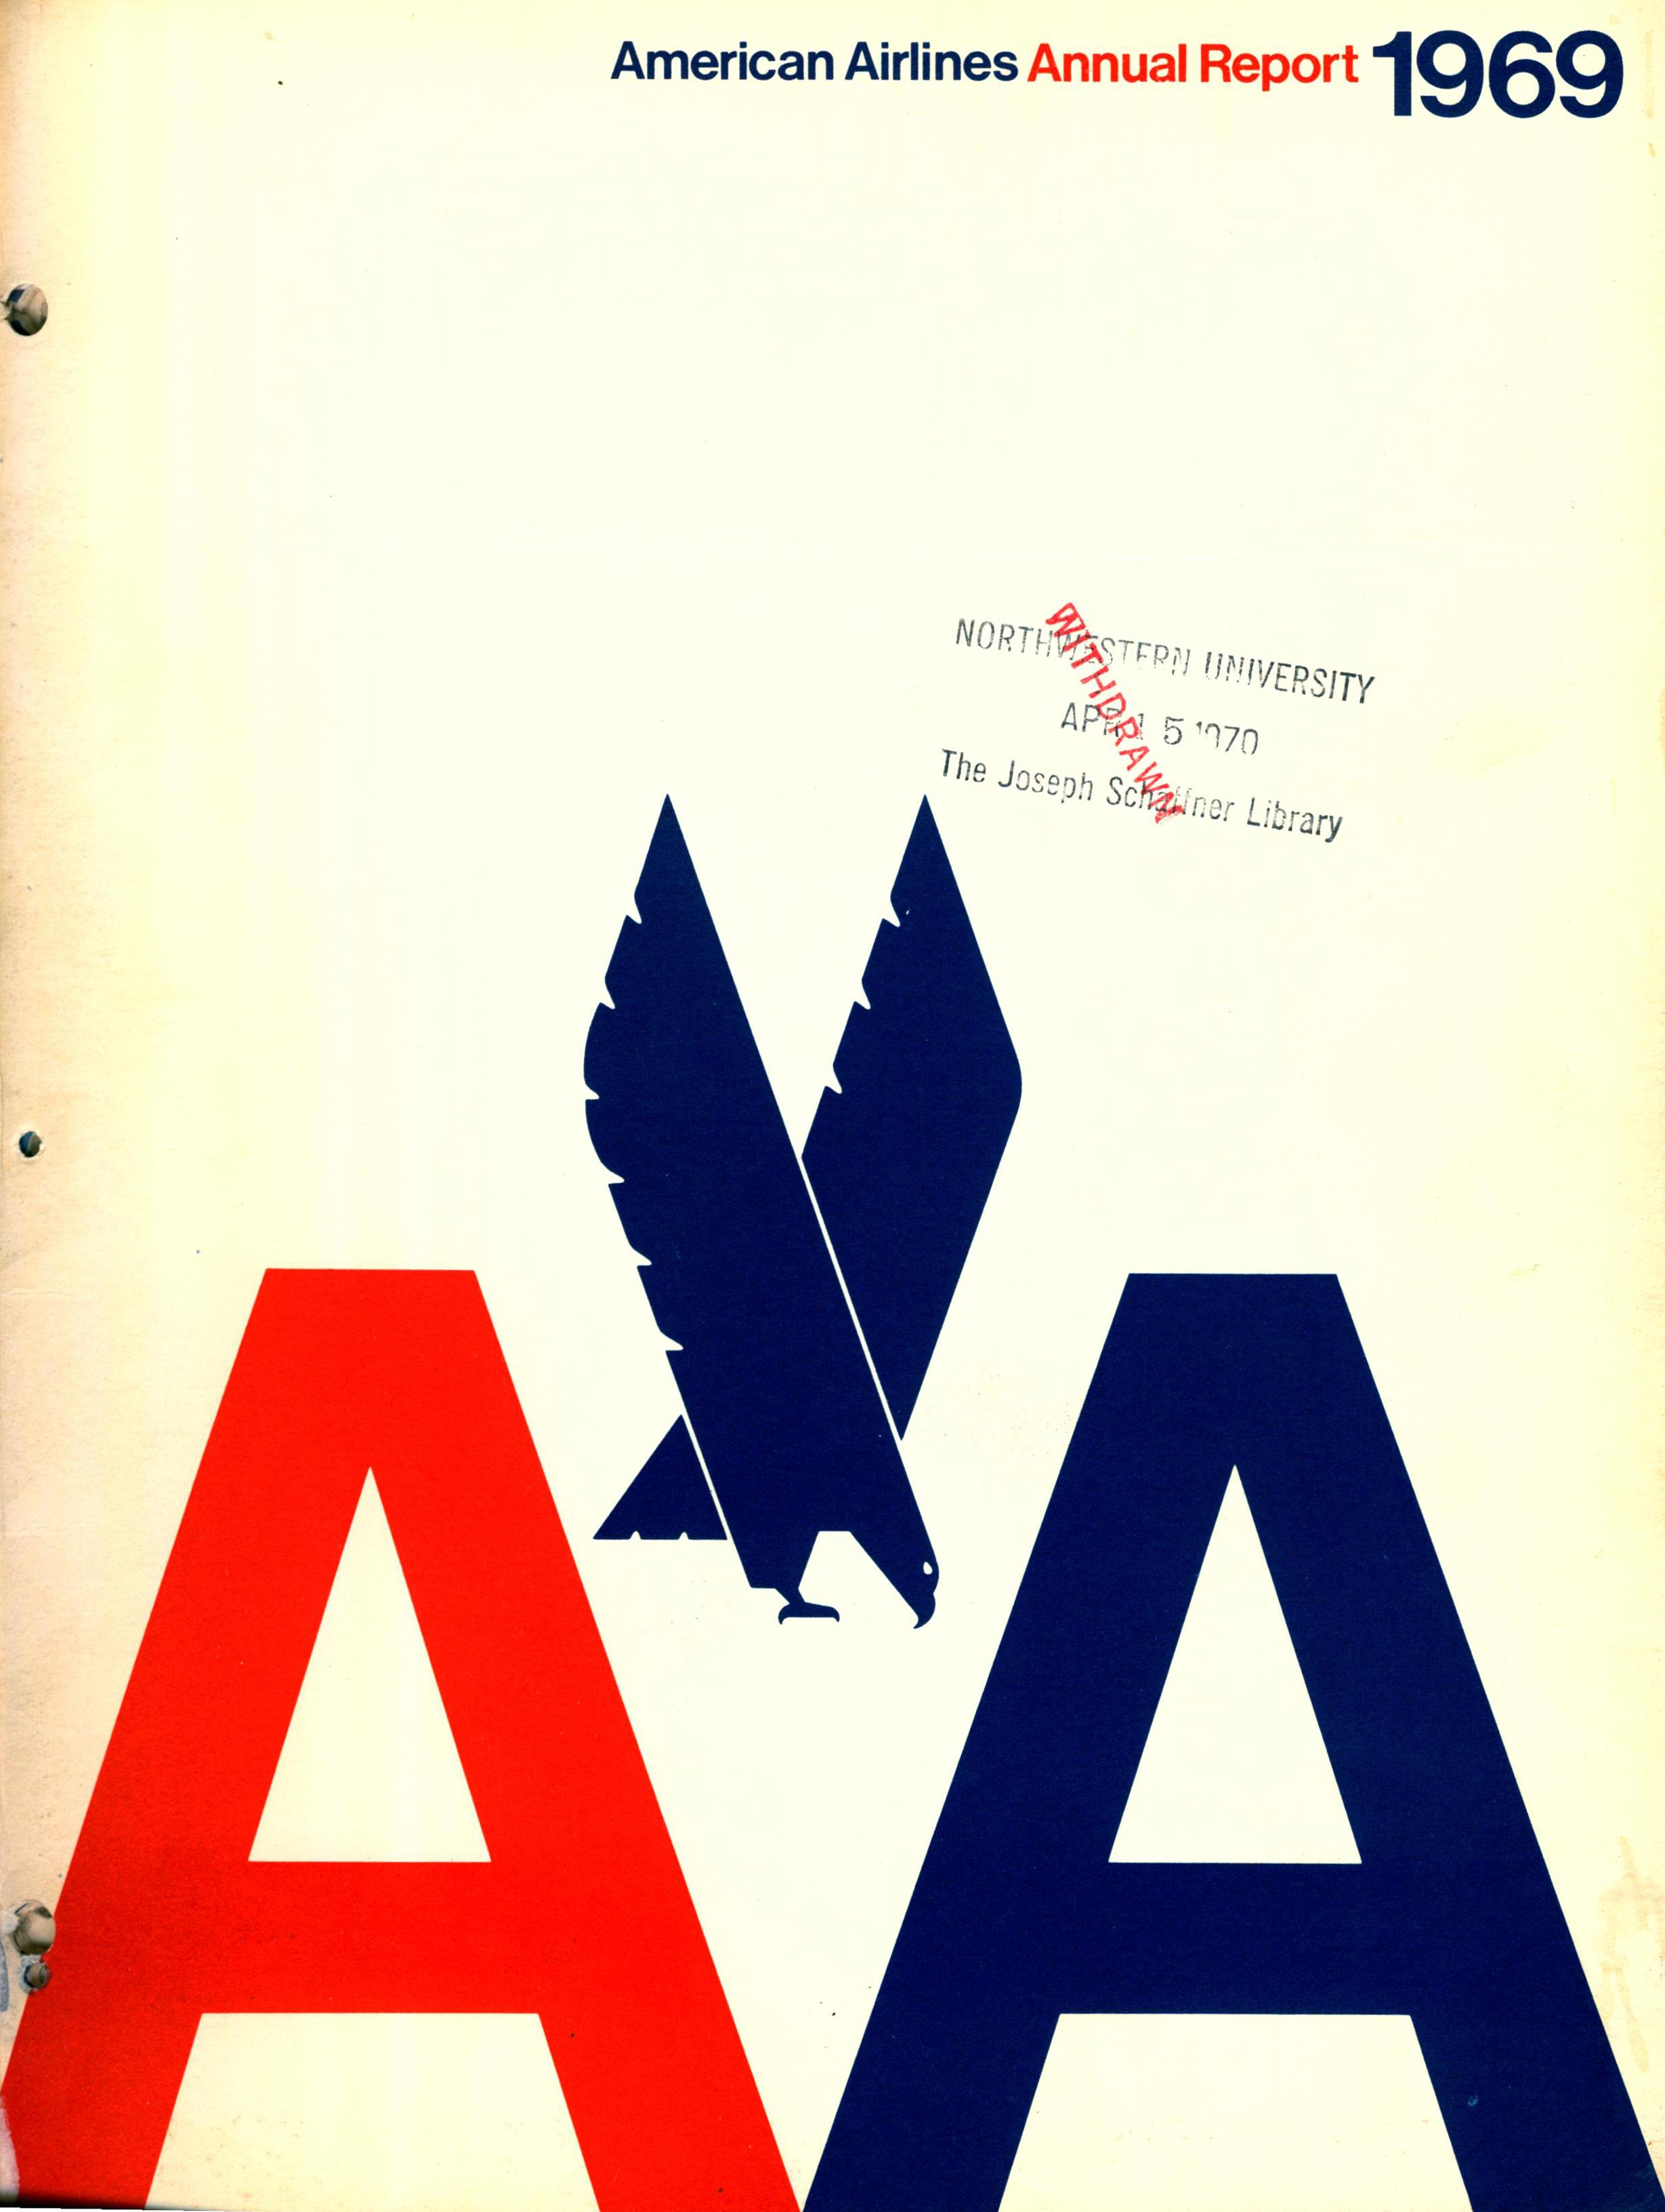 American Airlines Logo Transparent : american, airlines, transparent, American, Airlines, Board, Design